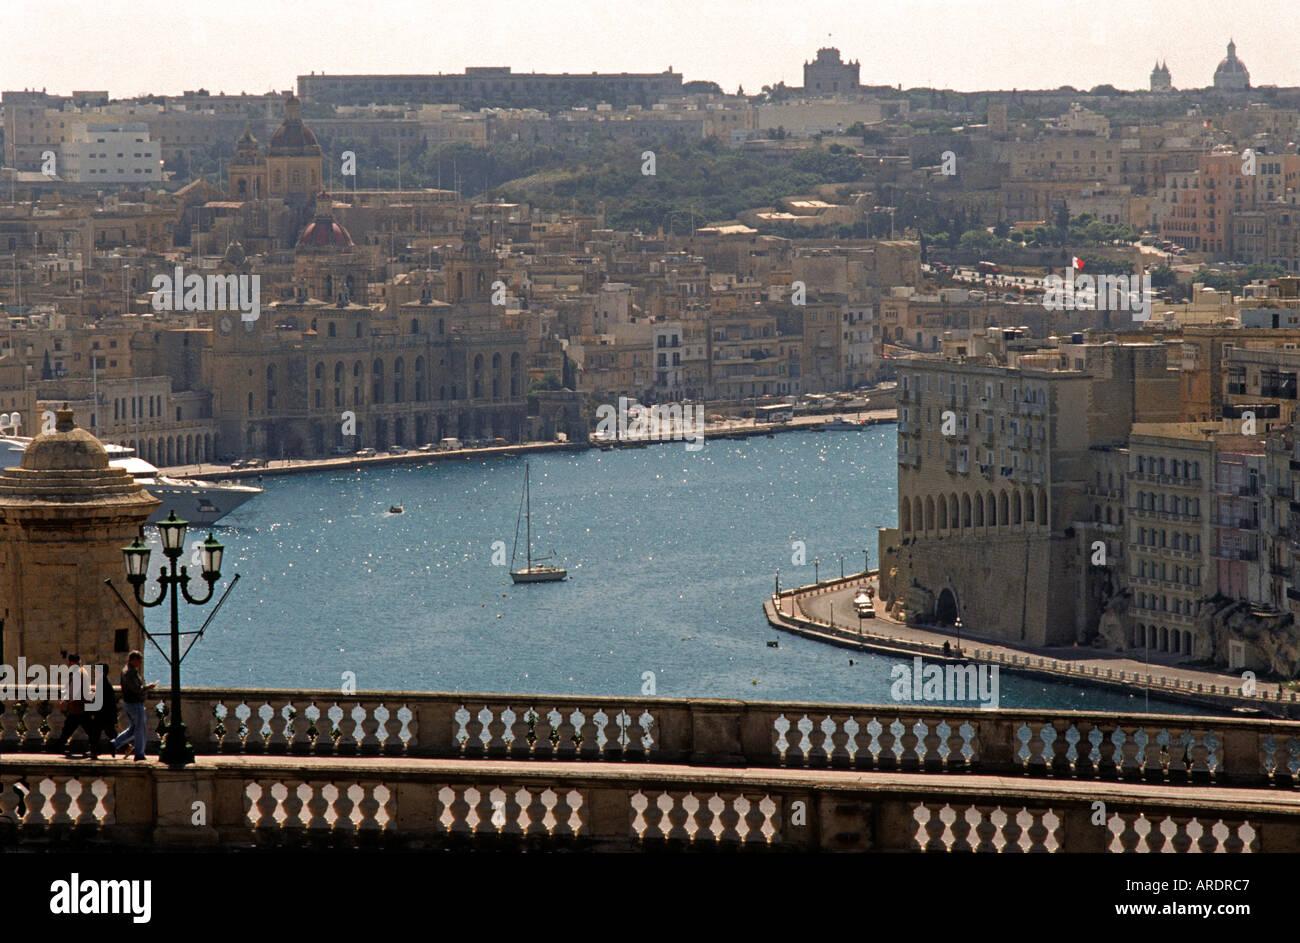 Scenic view across a bridge towards the Grand Harbour Valletta Malta Europe - Stock Image